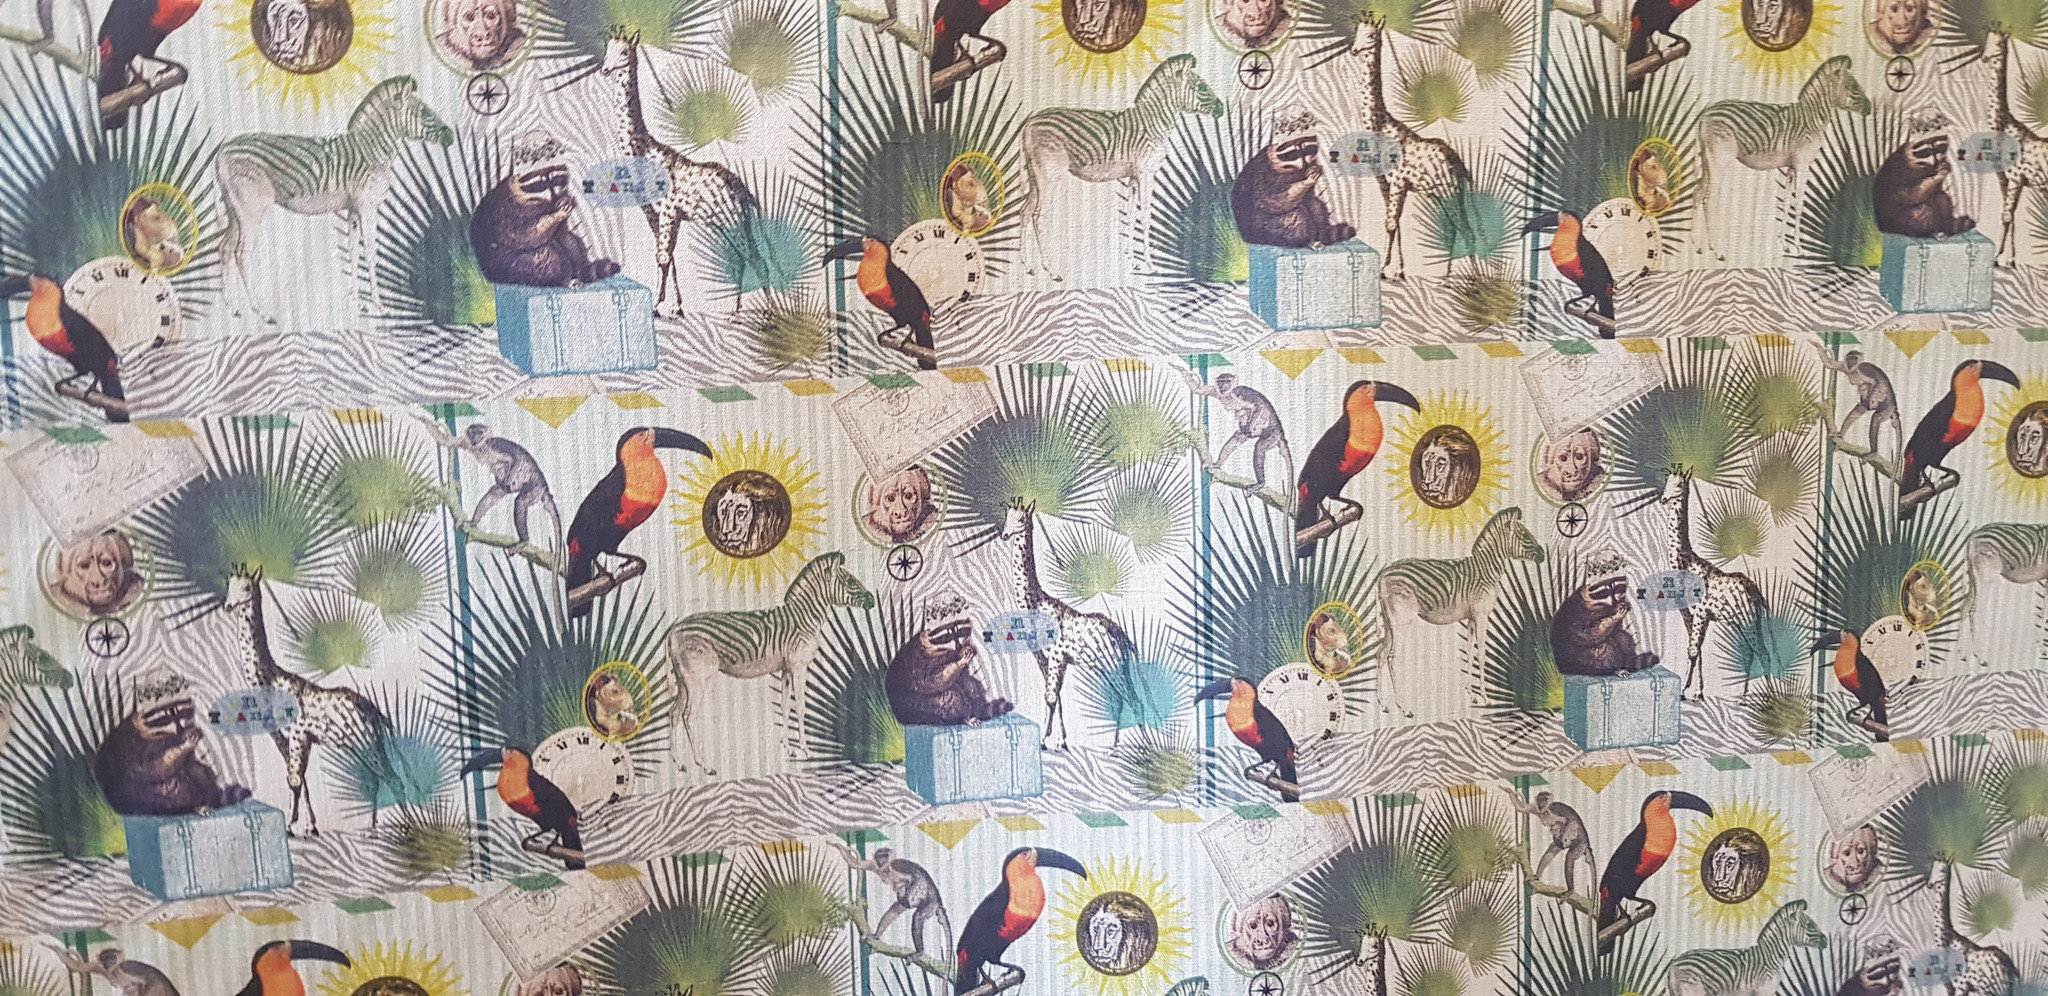 Le grenier du lin Fabric safari